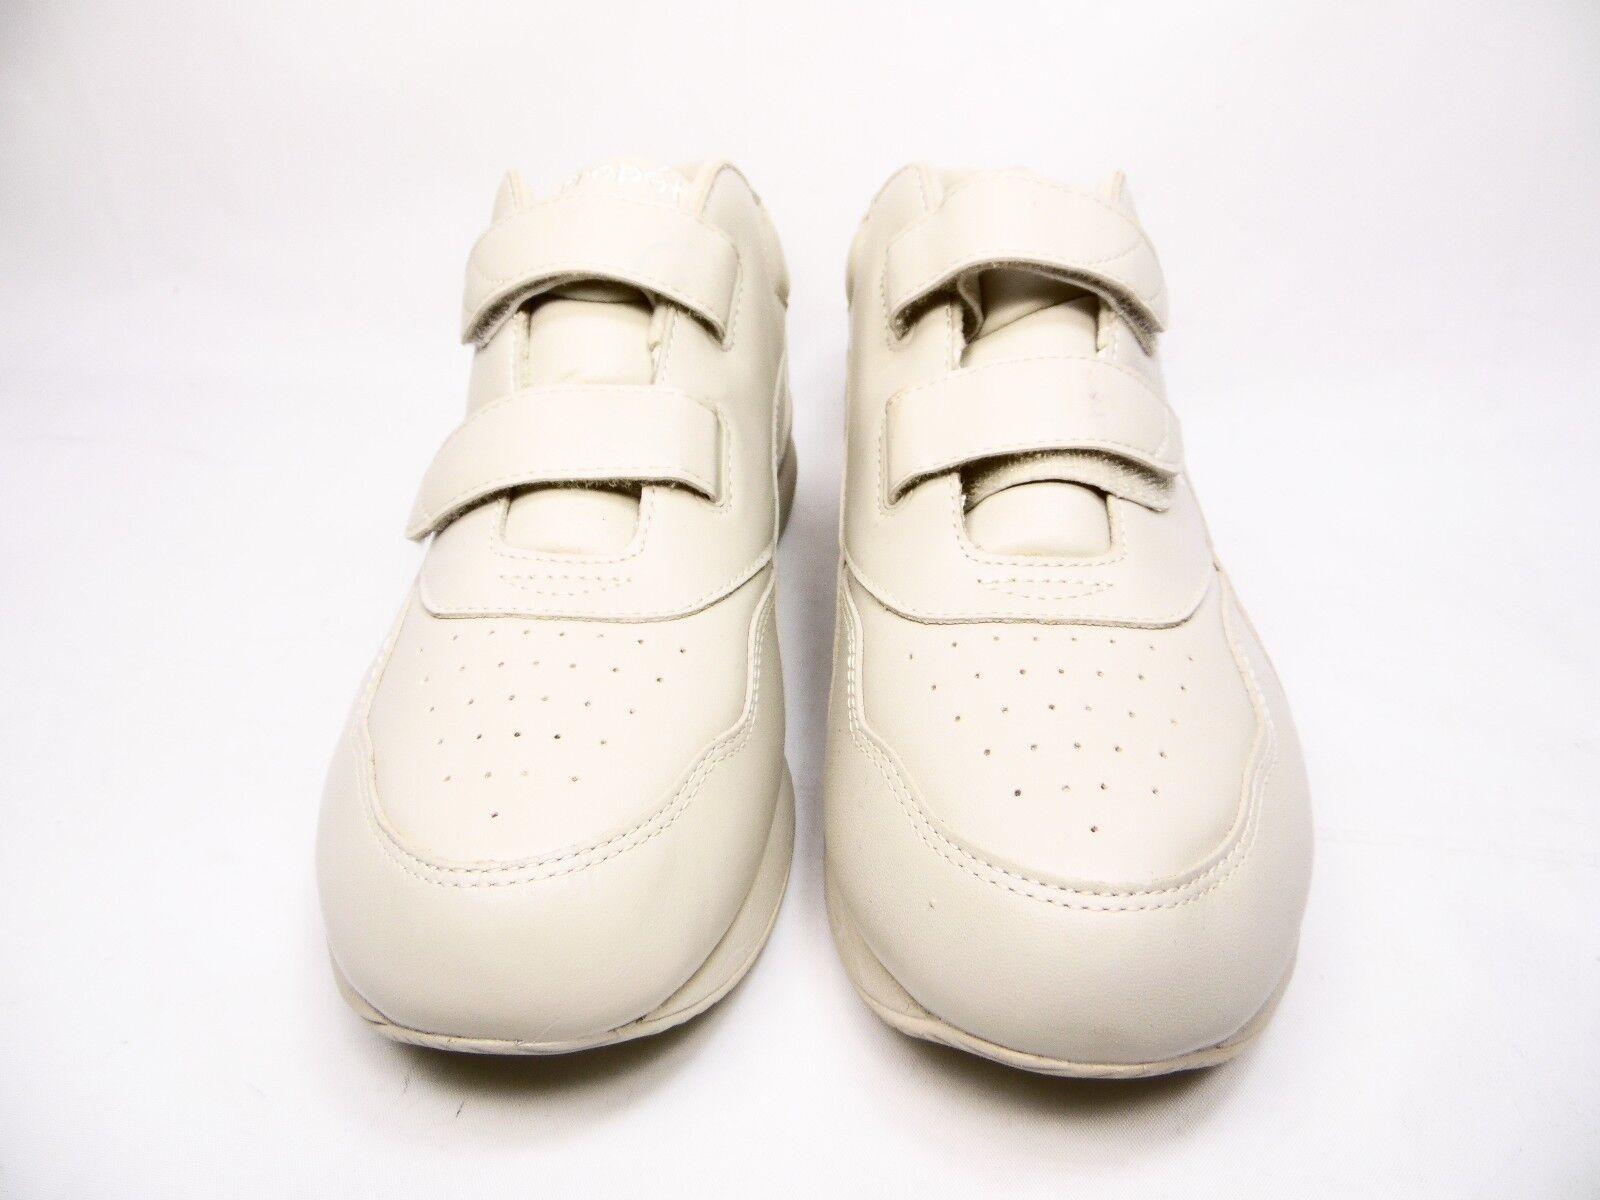 Propét Tour Walker Walker Walker Correa-Zapatos informales de mujer marrón topo talla 11 2E  ahorra 50% -75% de descuento